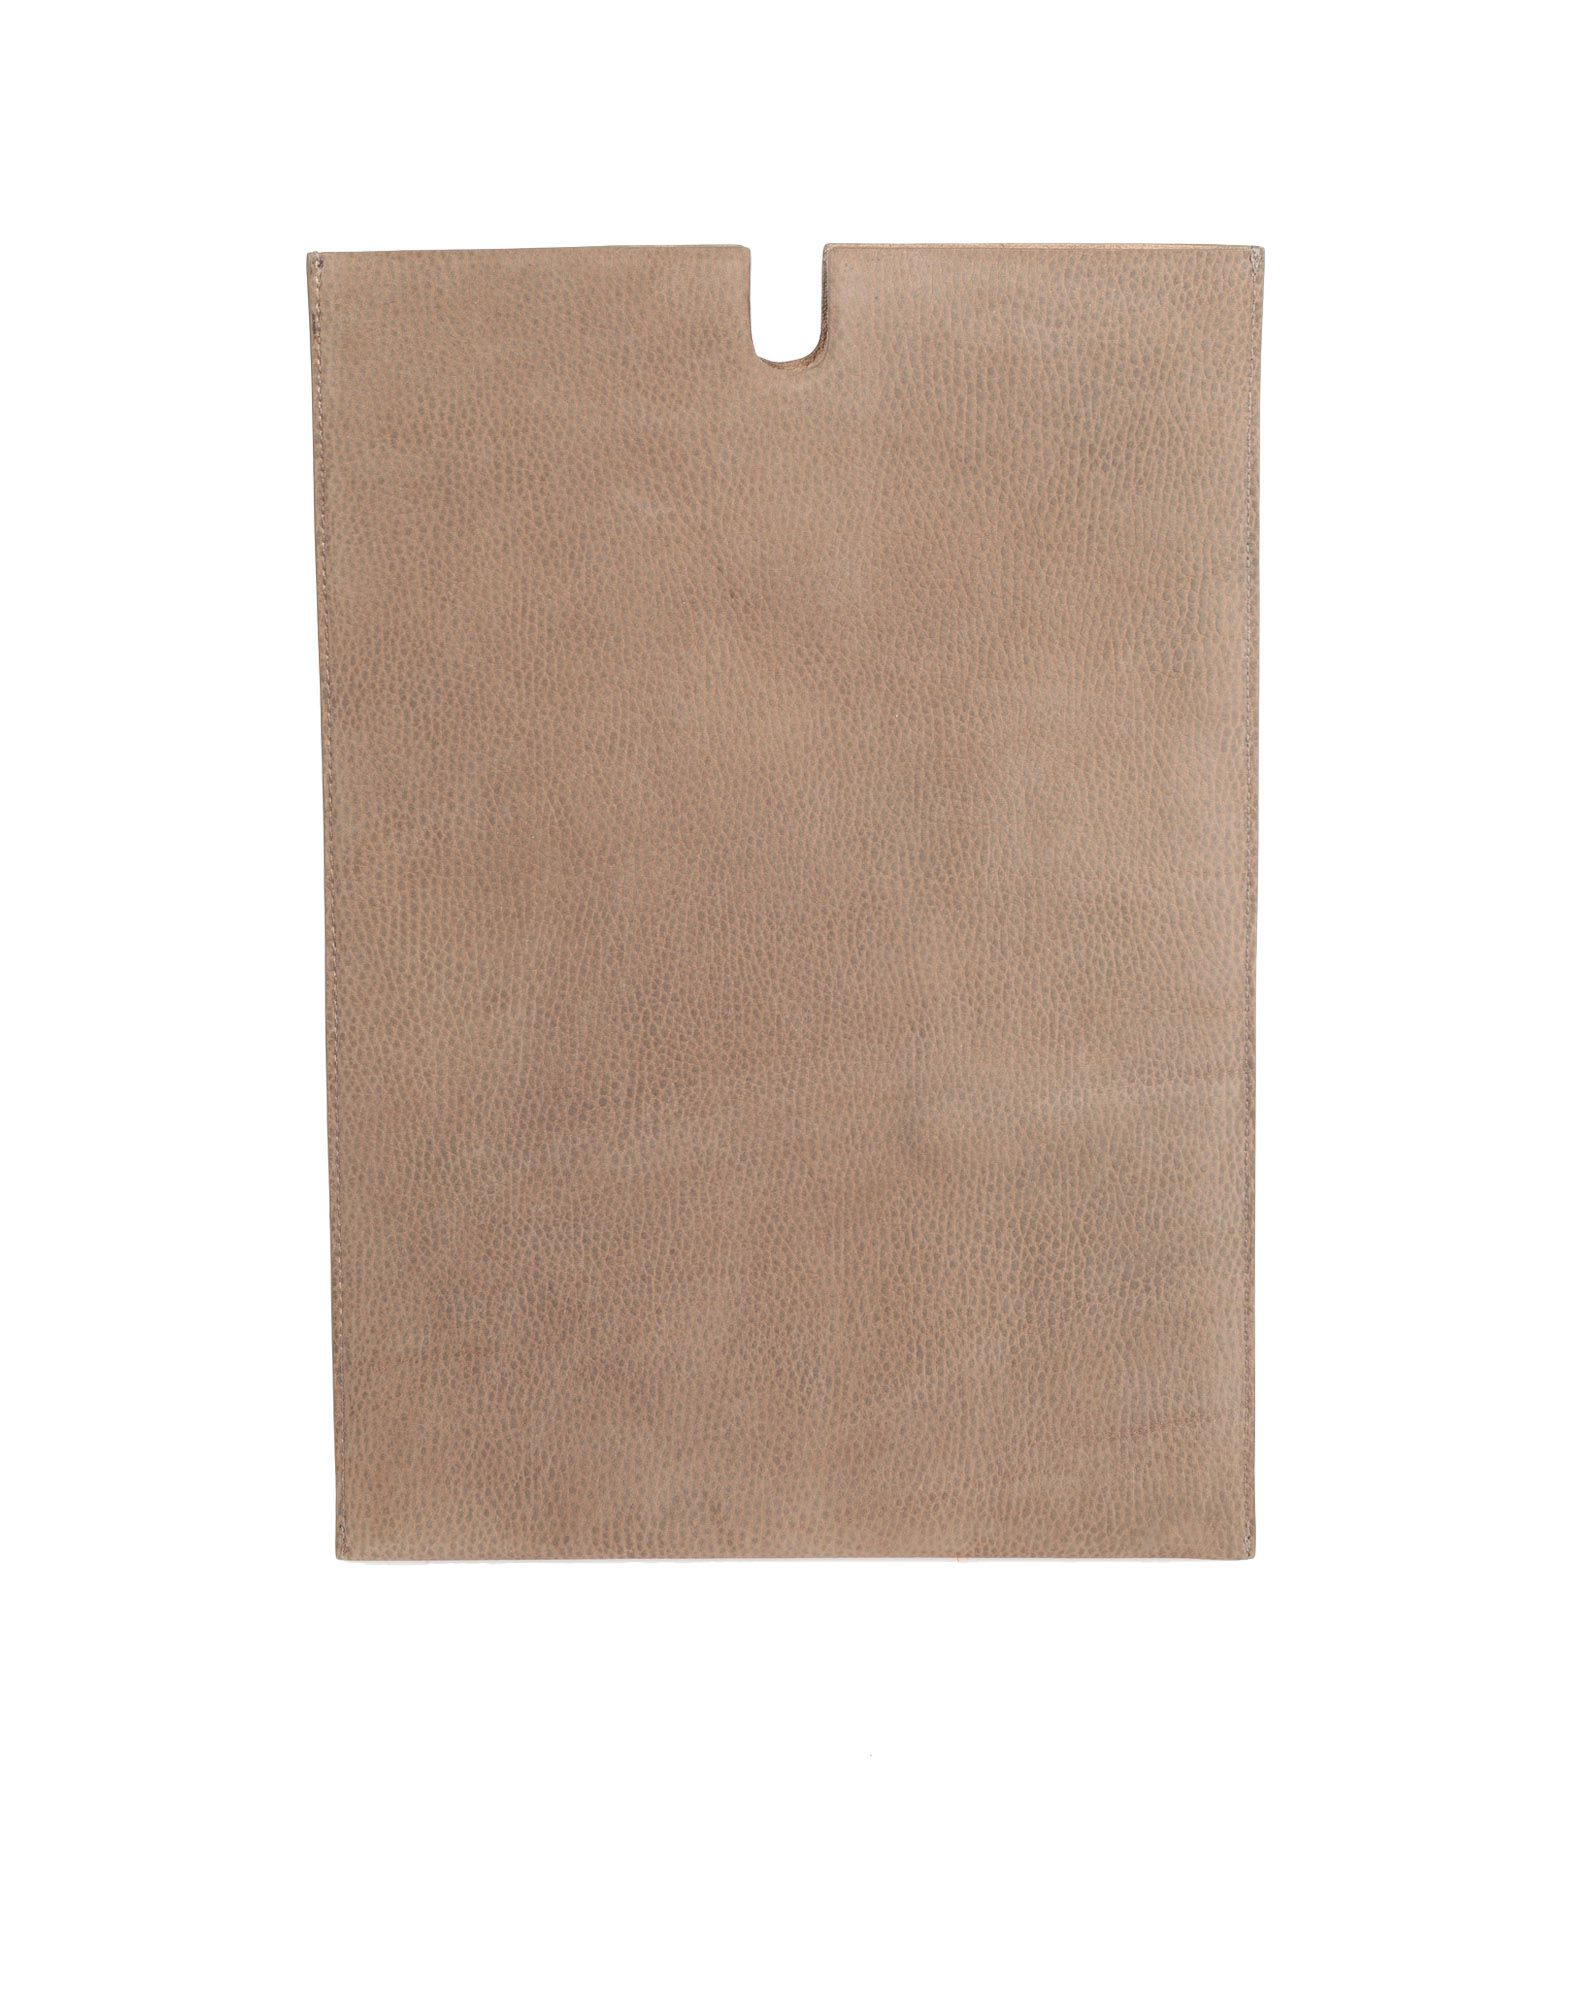 RICK OWENS Деловые сумки bag emilio masi сумки деловые